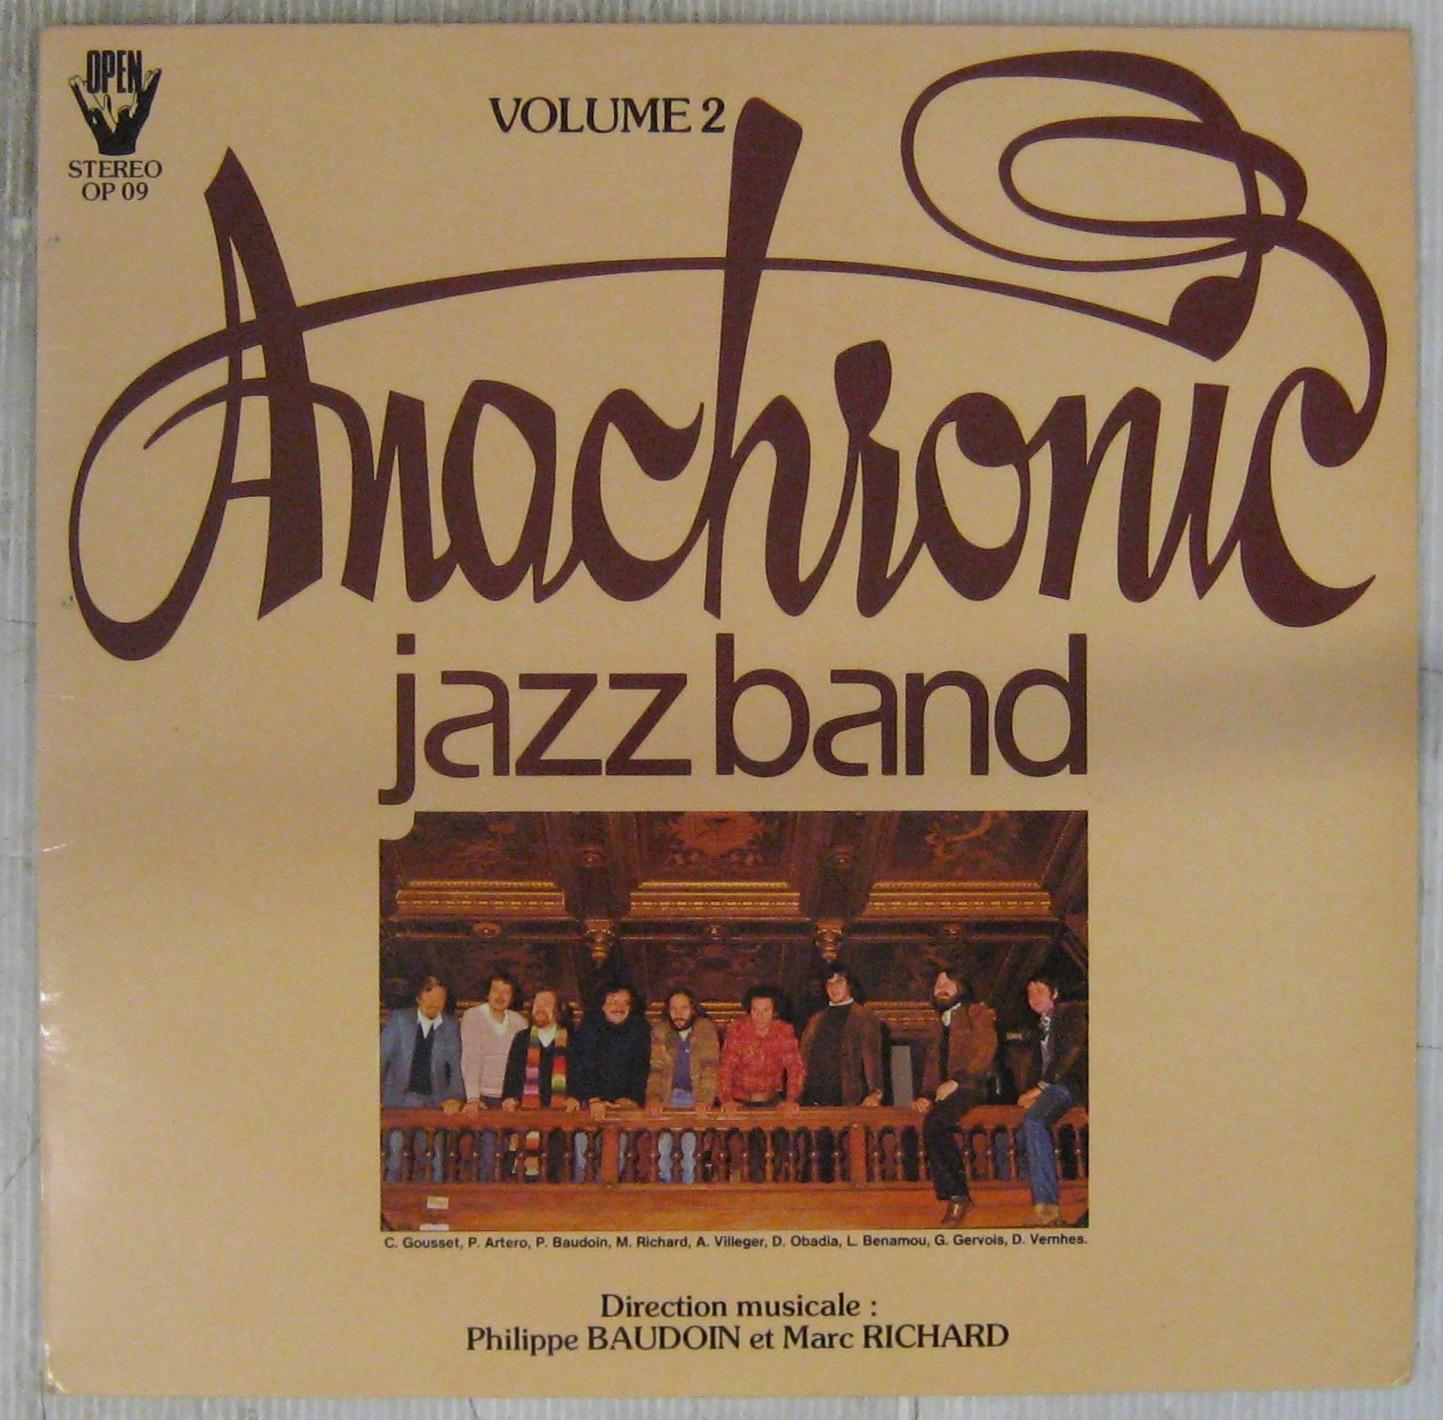 ANACHRONIC JAZZ BAND - Volume 2 - LP